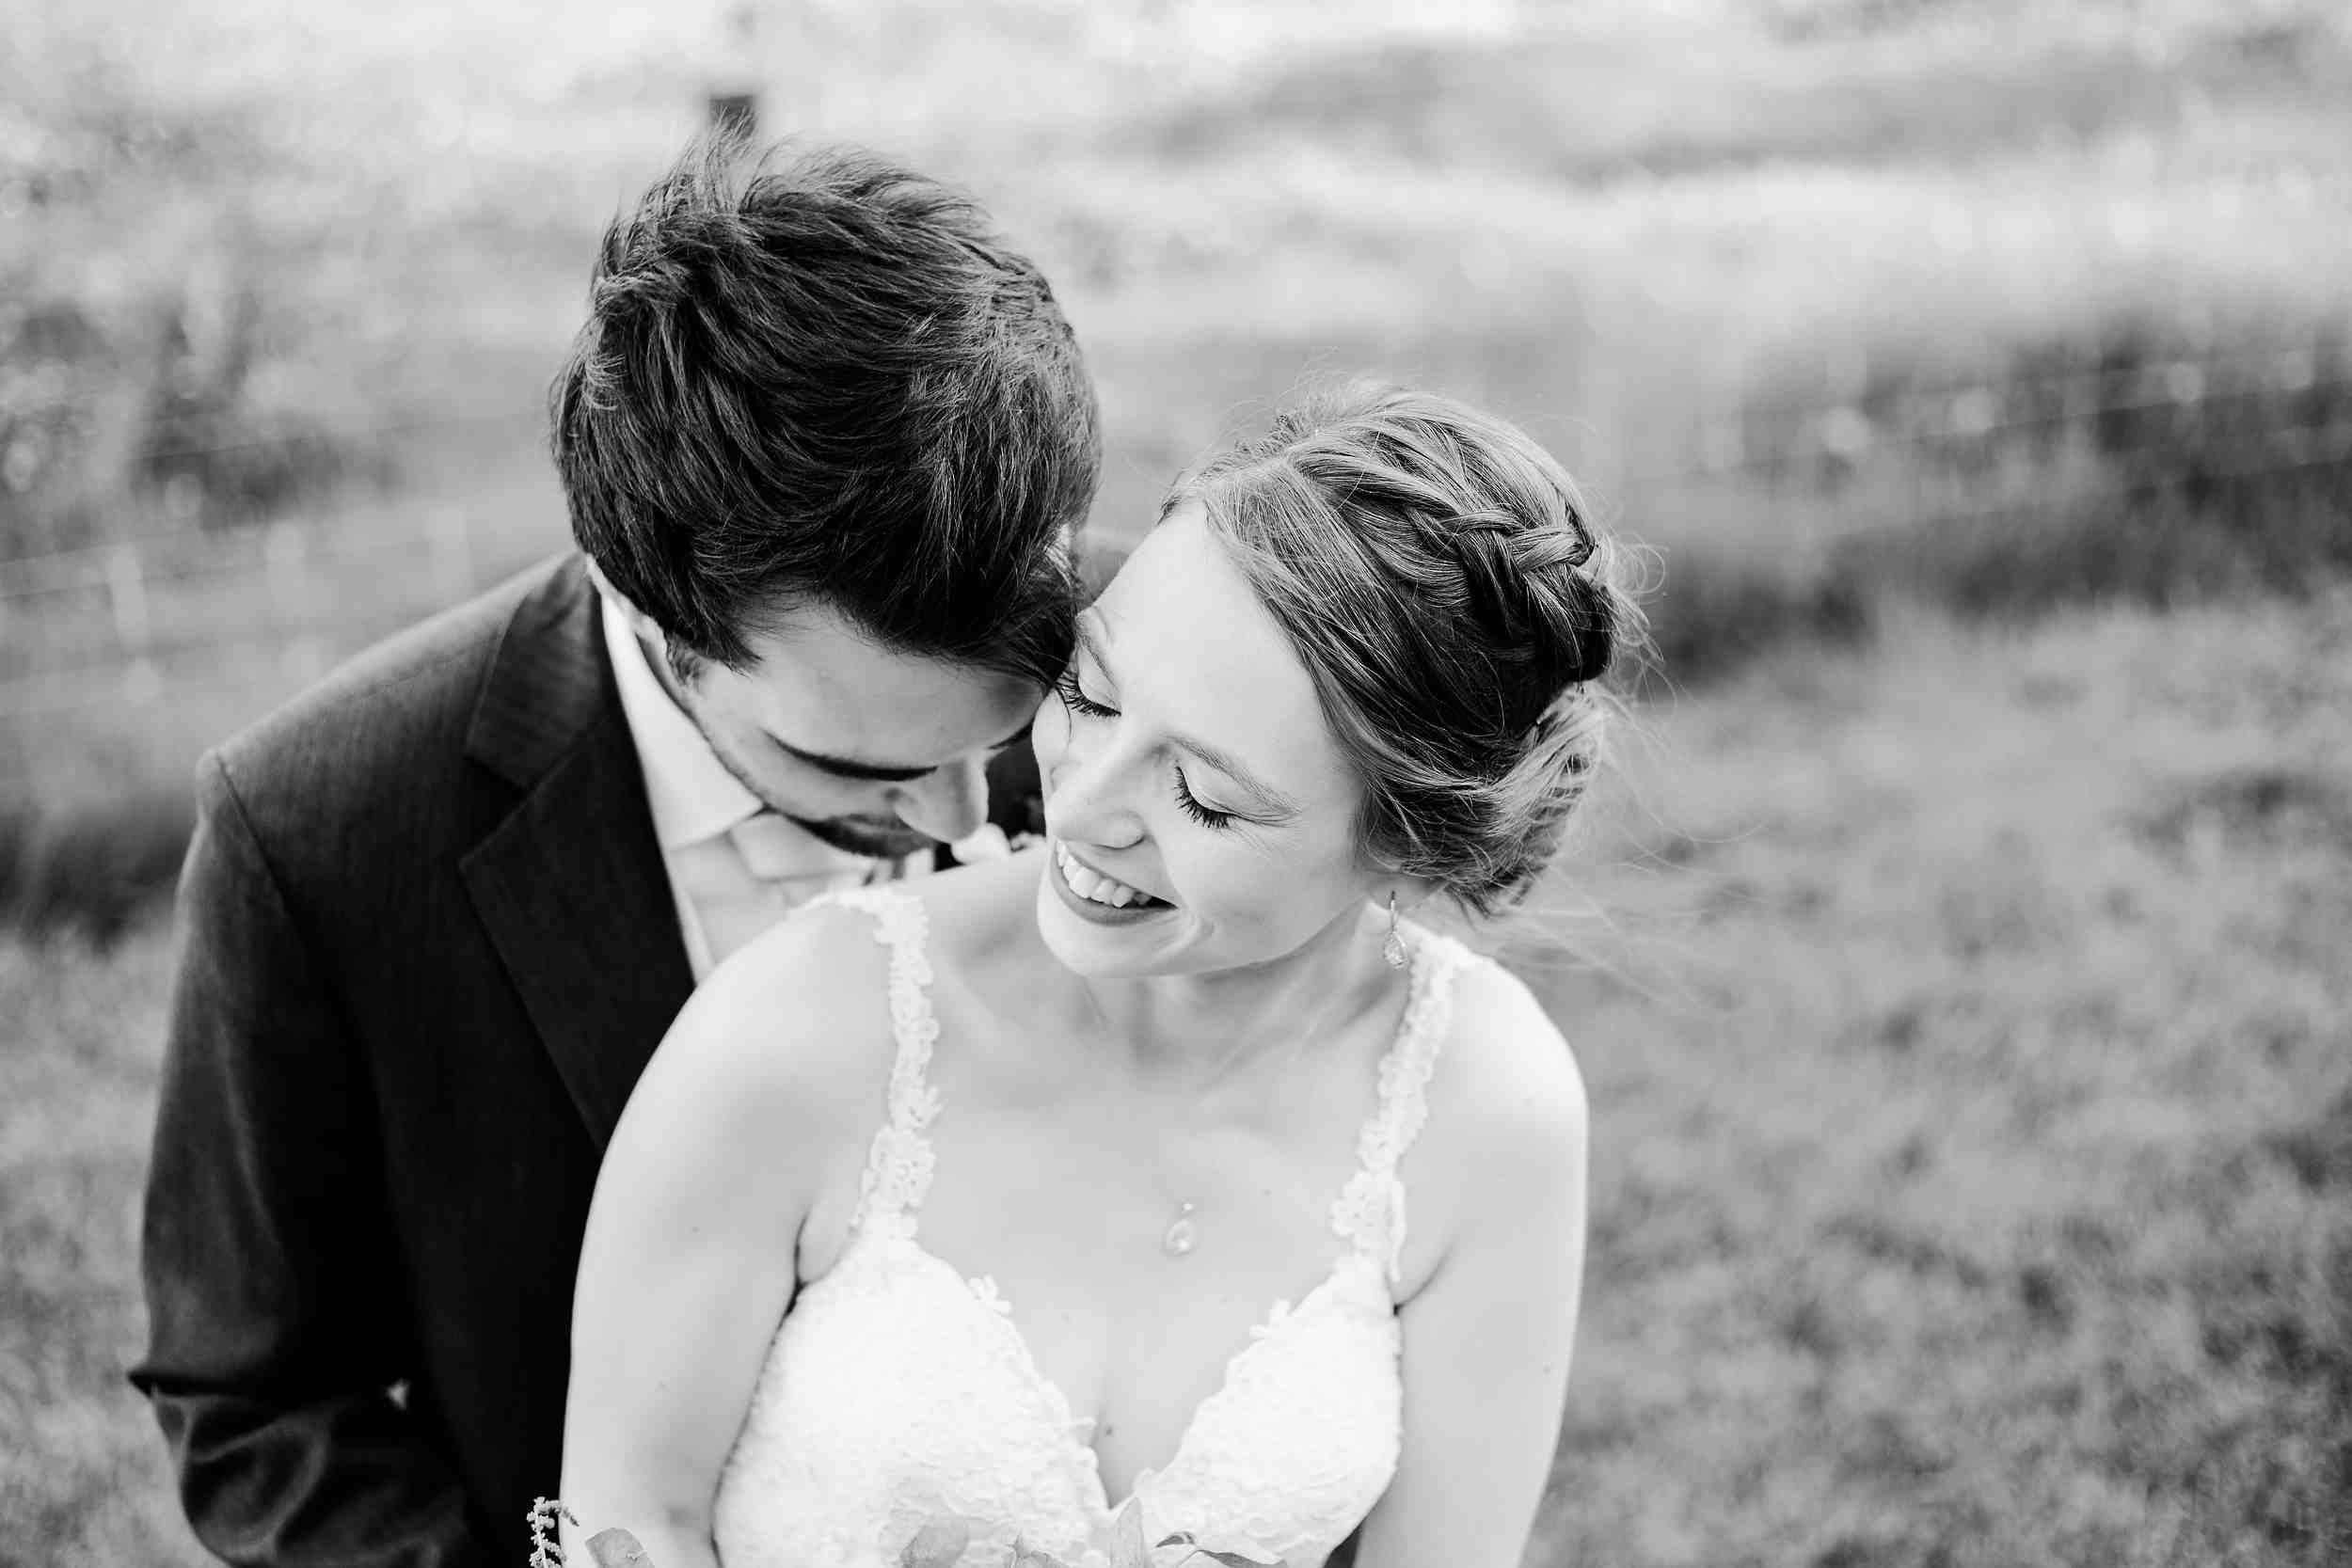 Modern_Stylish_Wedding_at_Swallows_Nest_Barn1272